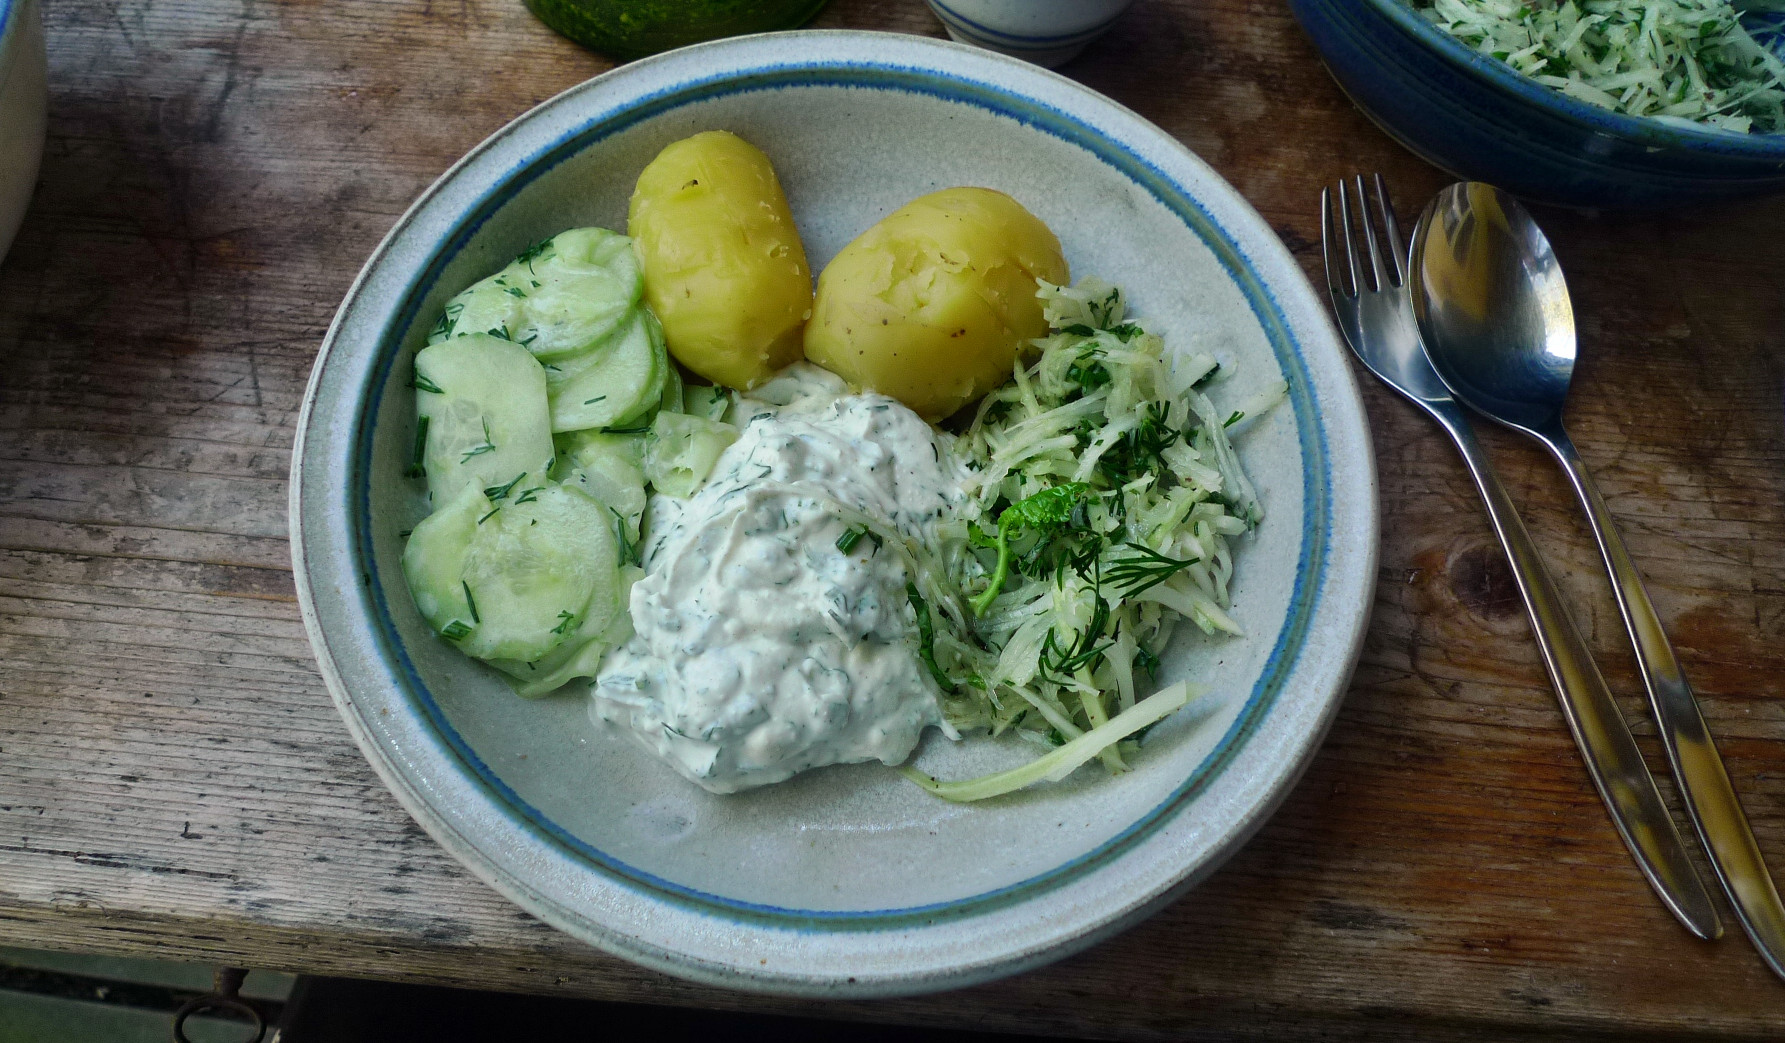 Quark,Kartoffeln,Salate - 24.4.15   (8)